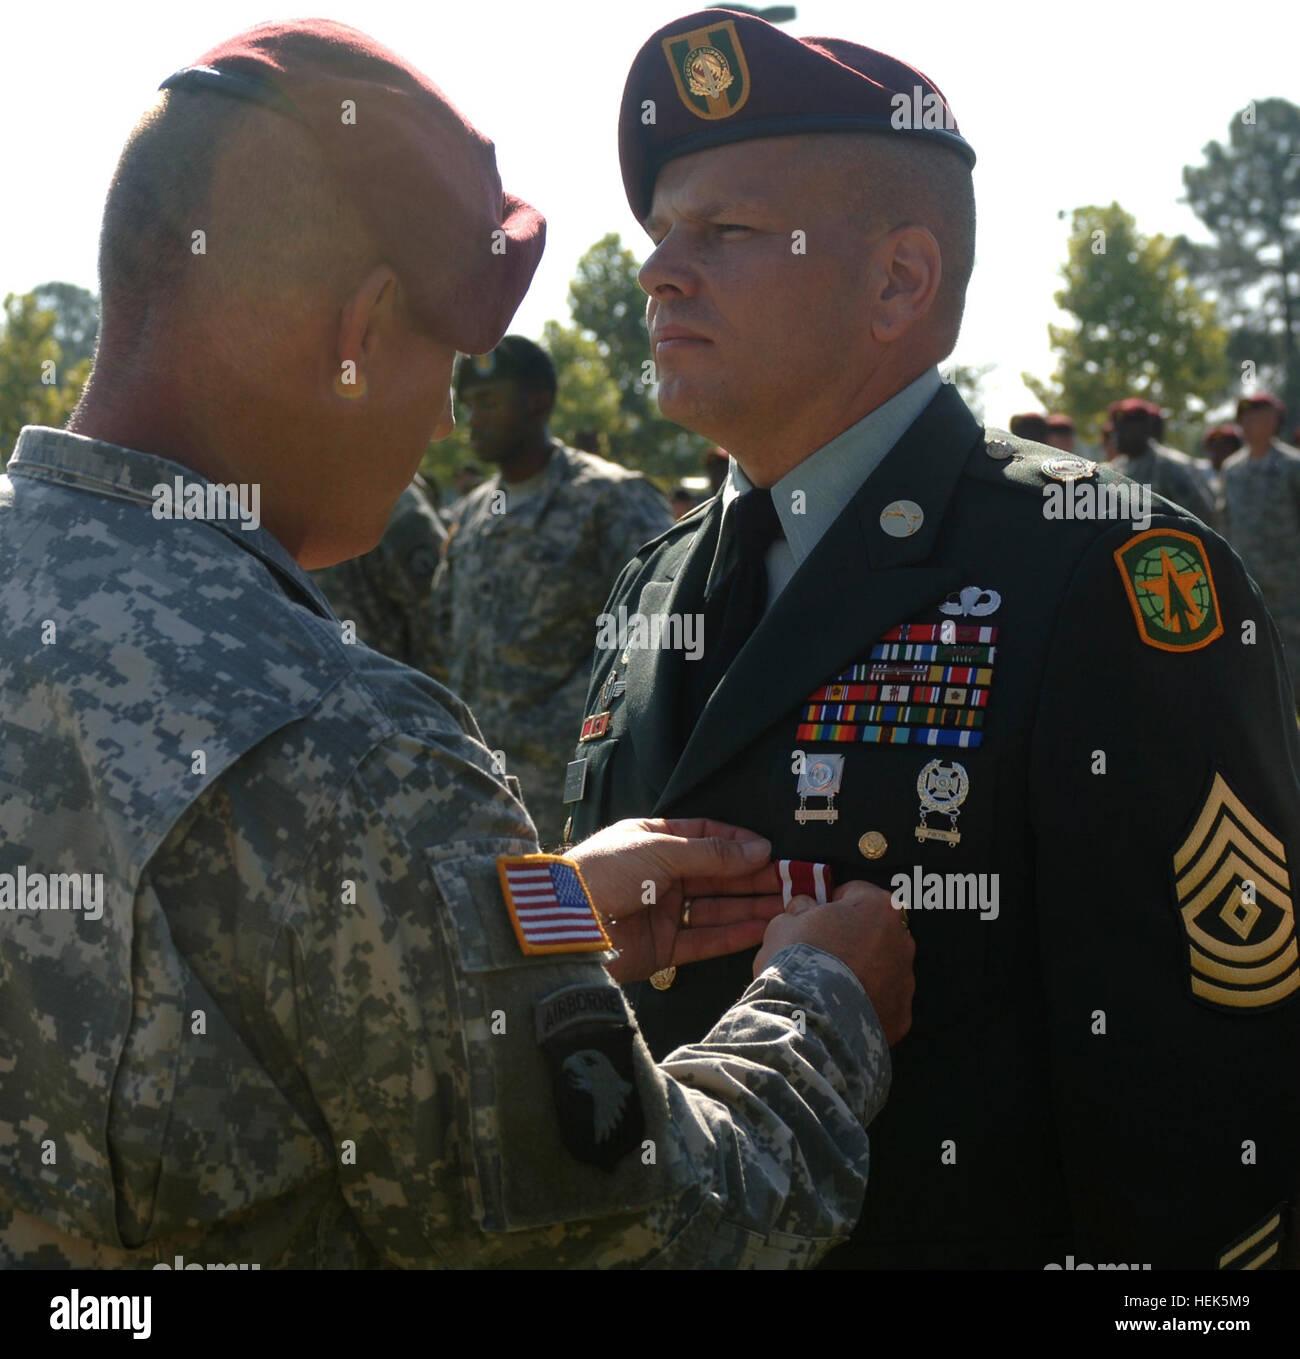 1st Sgt  James W  Brooks, of Headquarters, Headquarters Company 16th